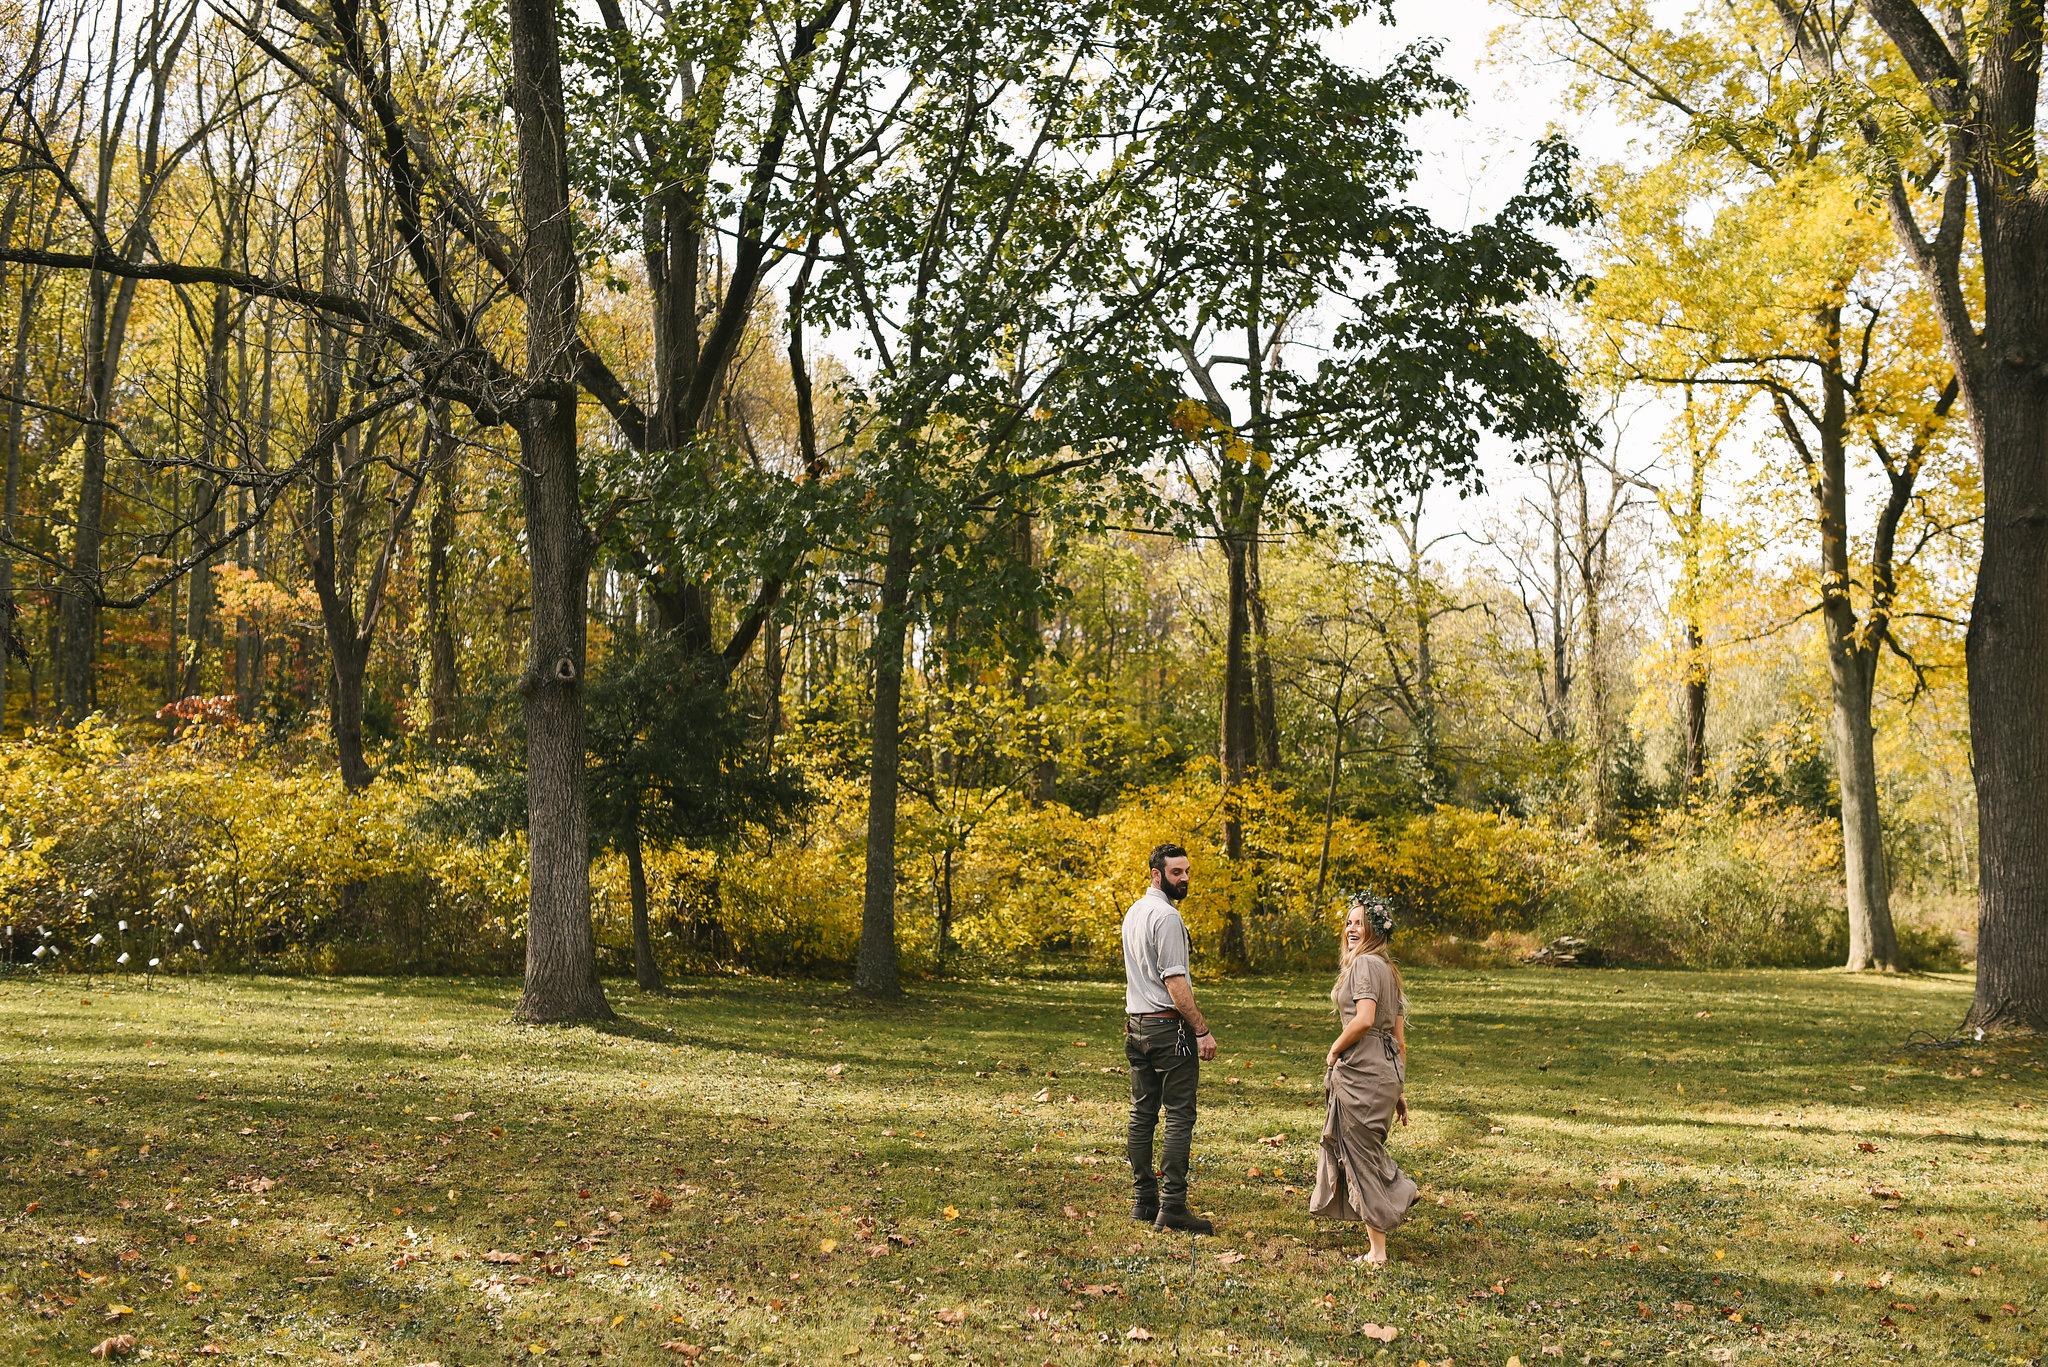 Baltimore, Maryland Wedding Photographer, Backyard Wedding, DIY, Rustic, Casual, Fall Wedding, Woodland, Bride and Groom Walking Through Field